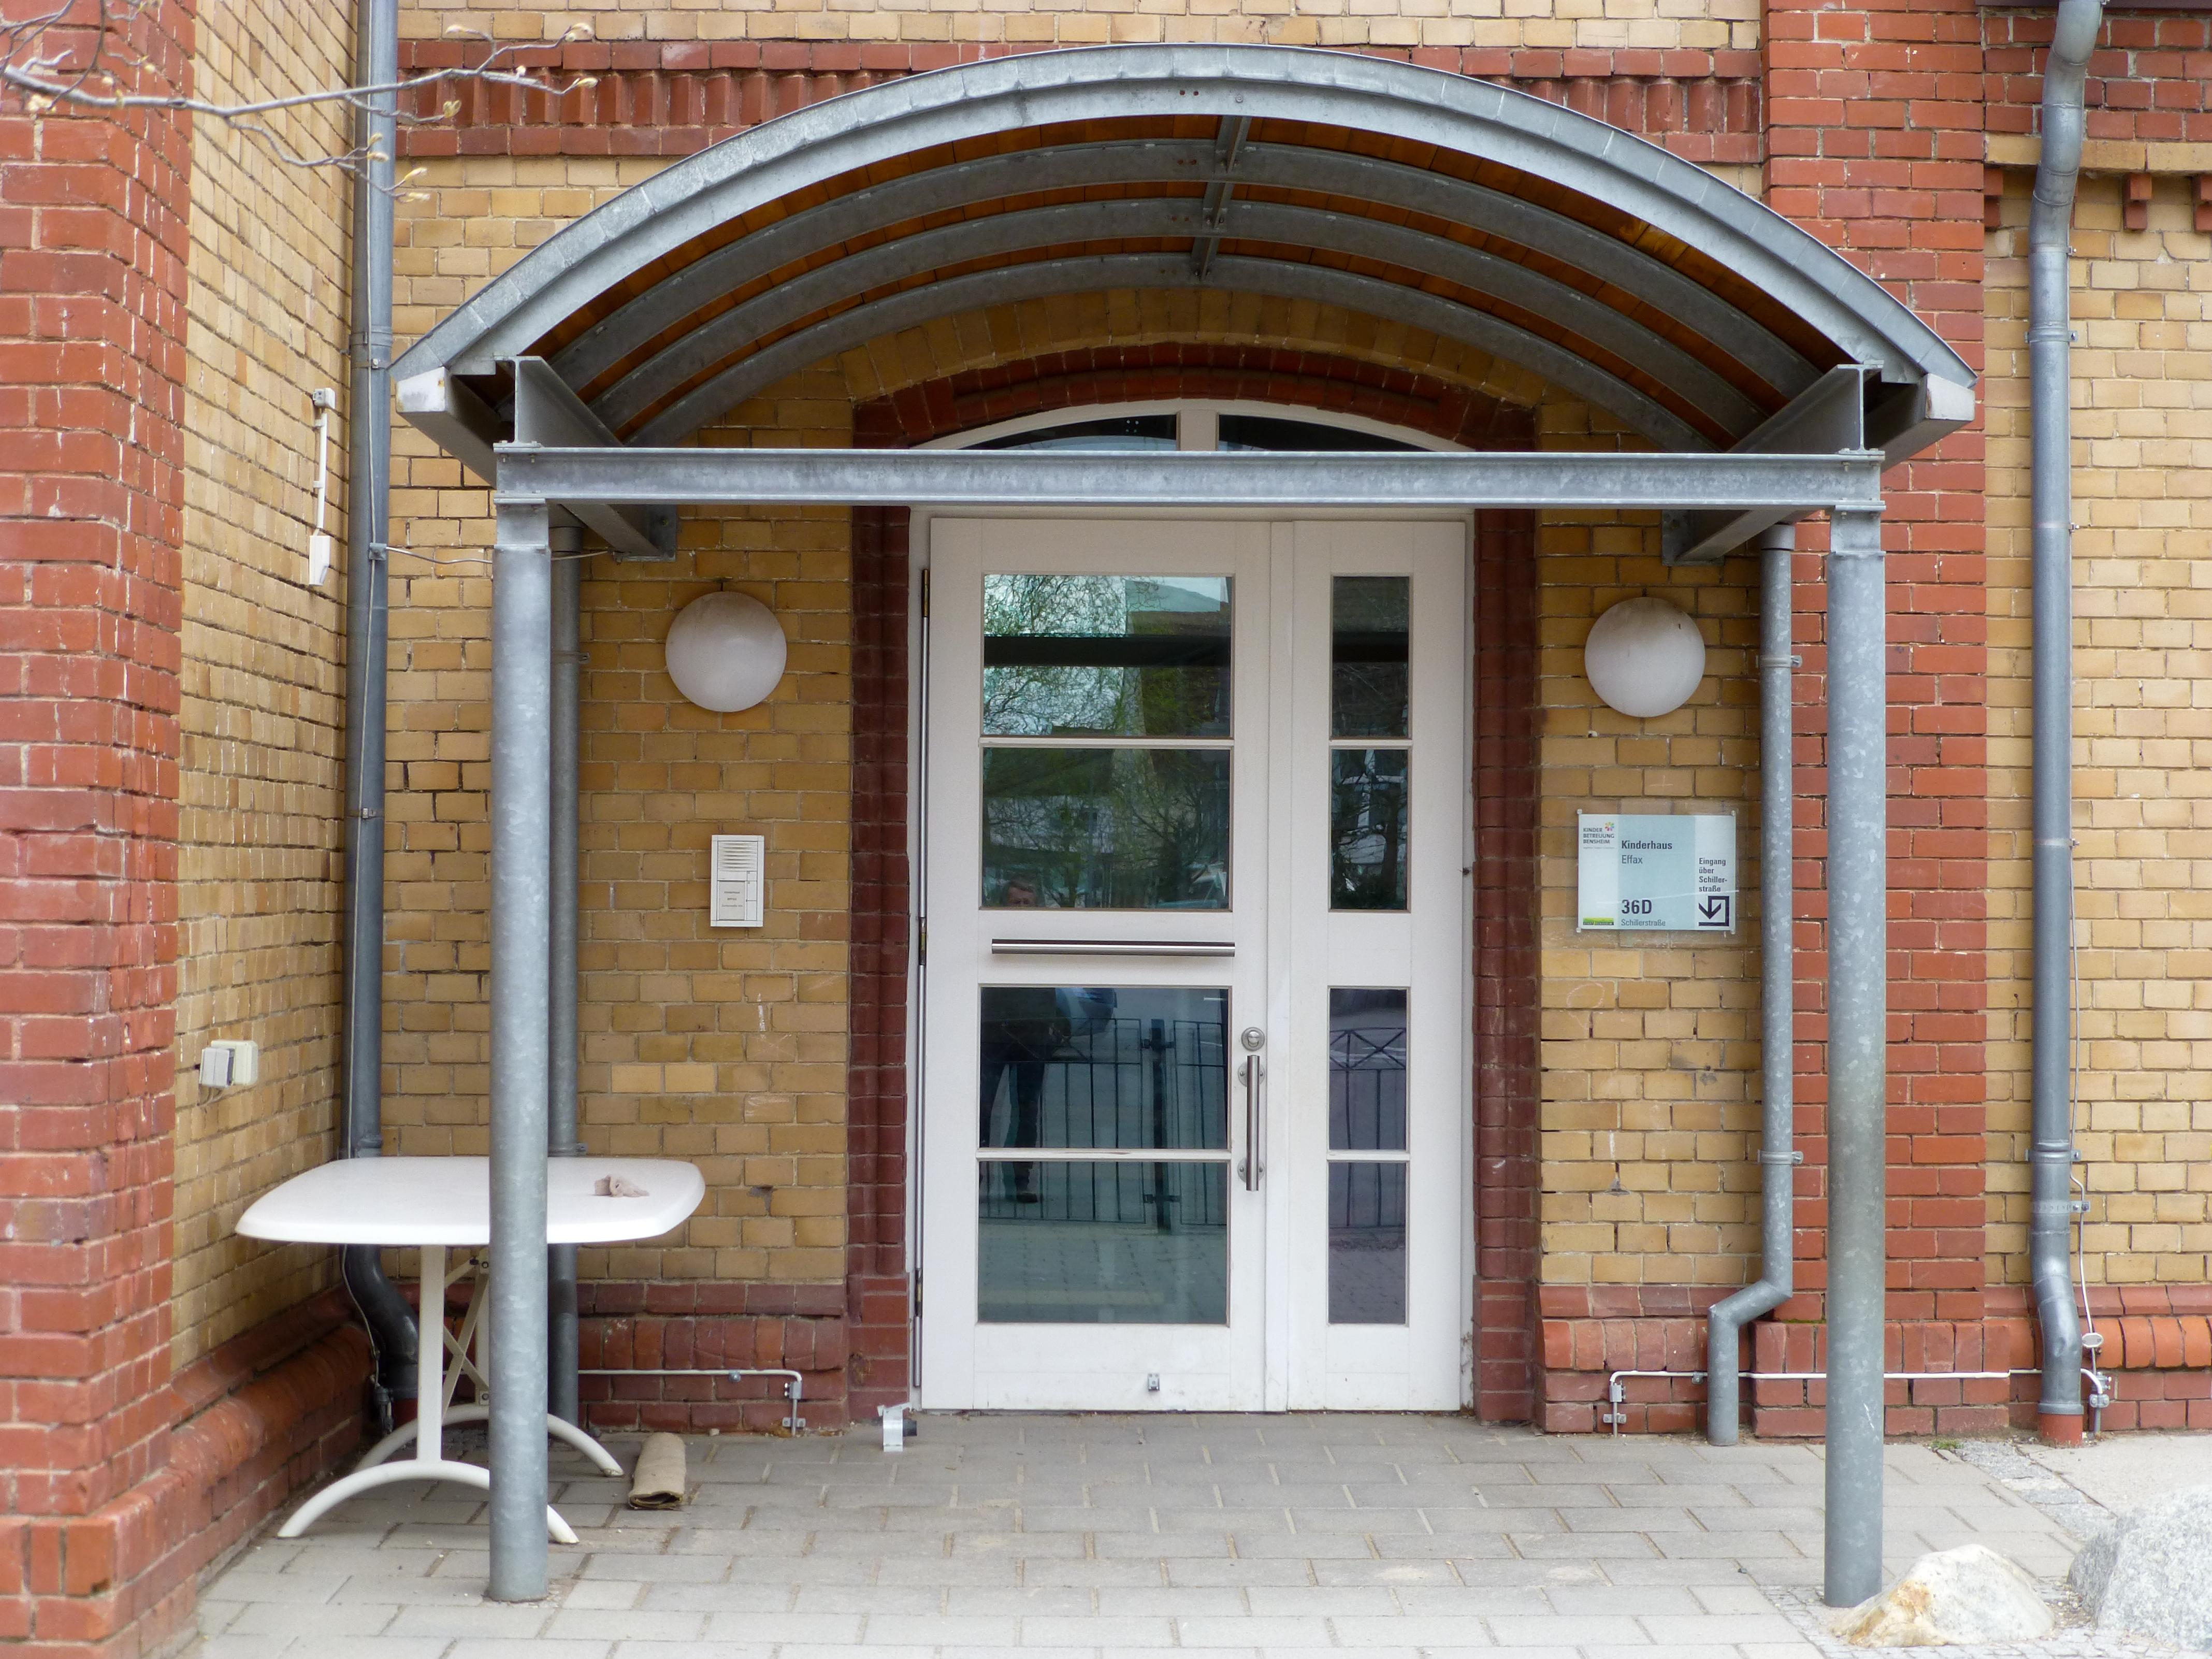 File:Bensheim-Auerbach, Ehemaliges Elektrizitätswerk-03-Eingang.jpg